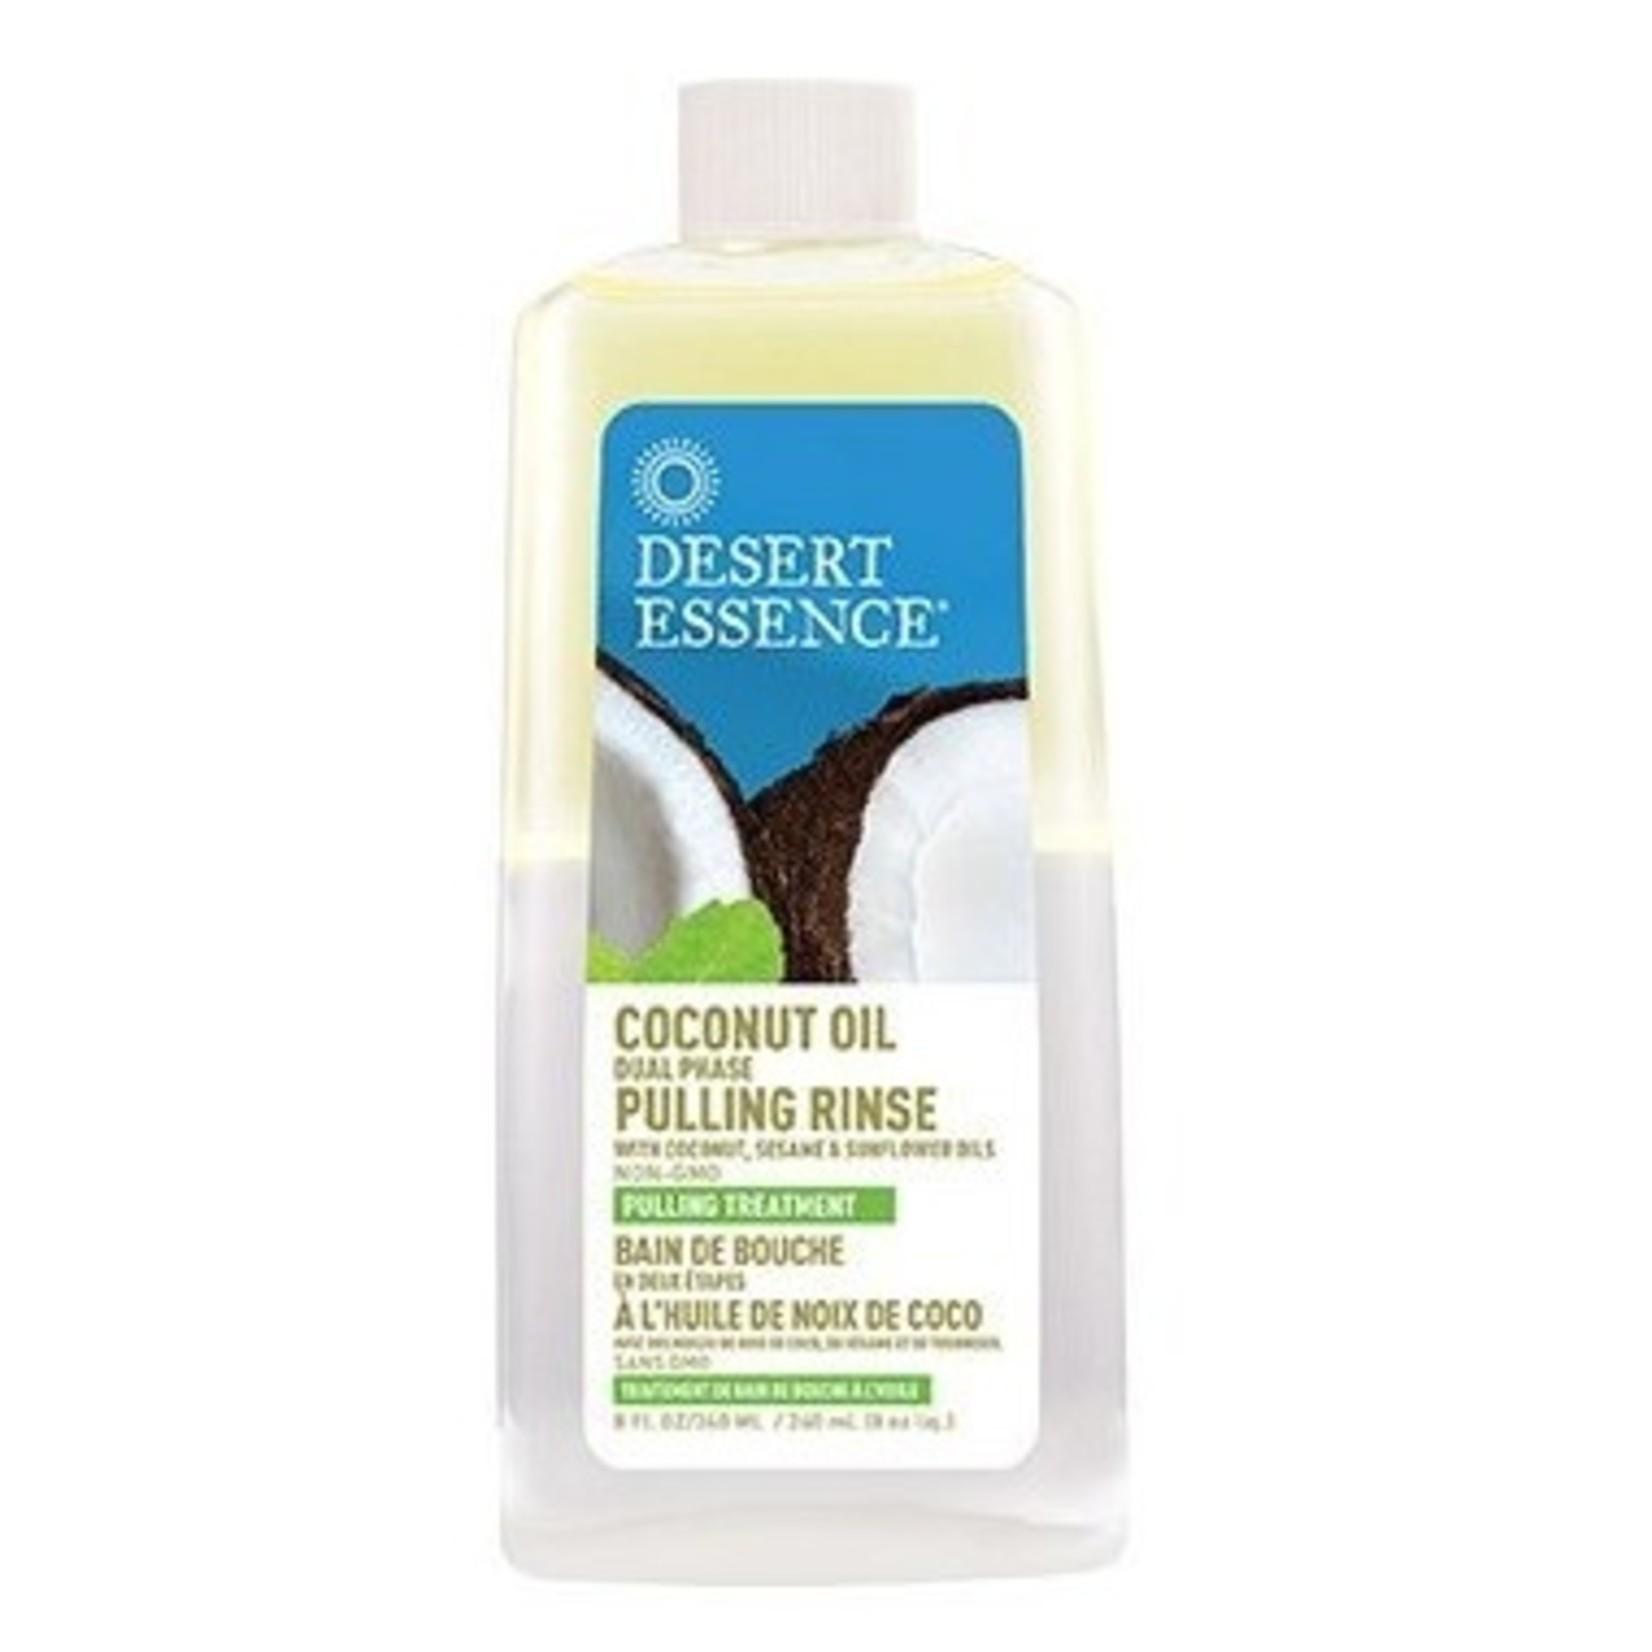 Desert Essence Coconut Oil Dual Phase Pulling Rinse 237ml